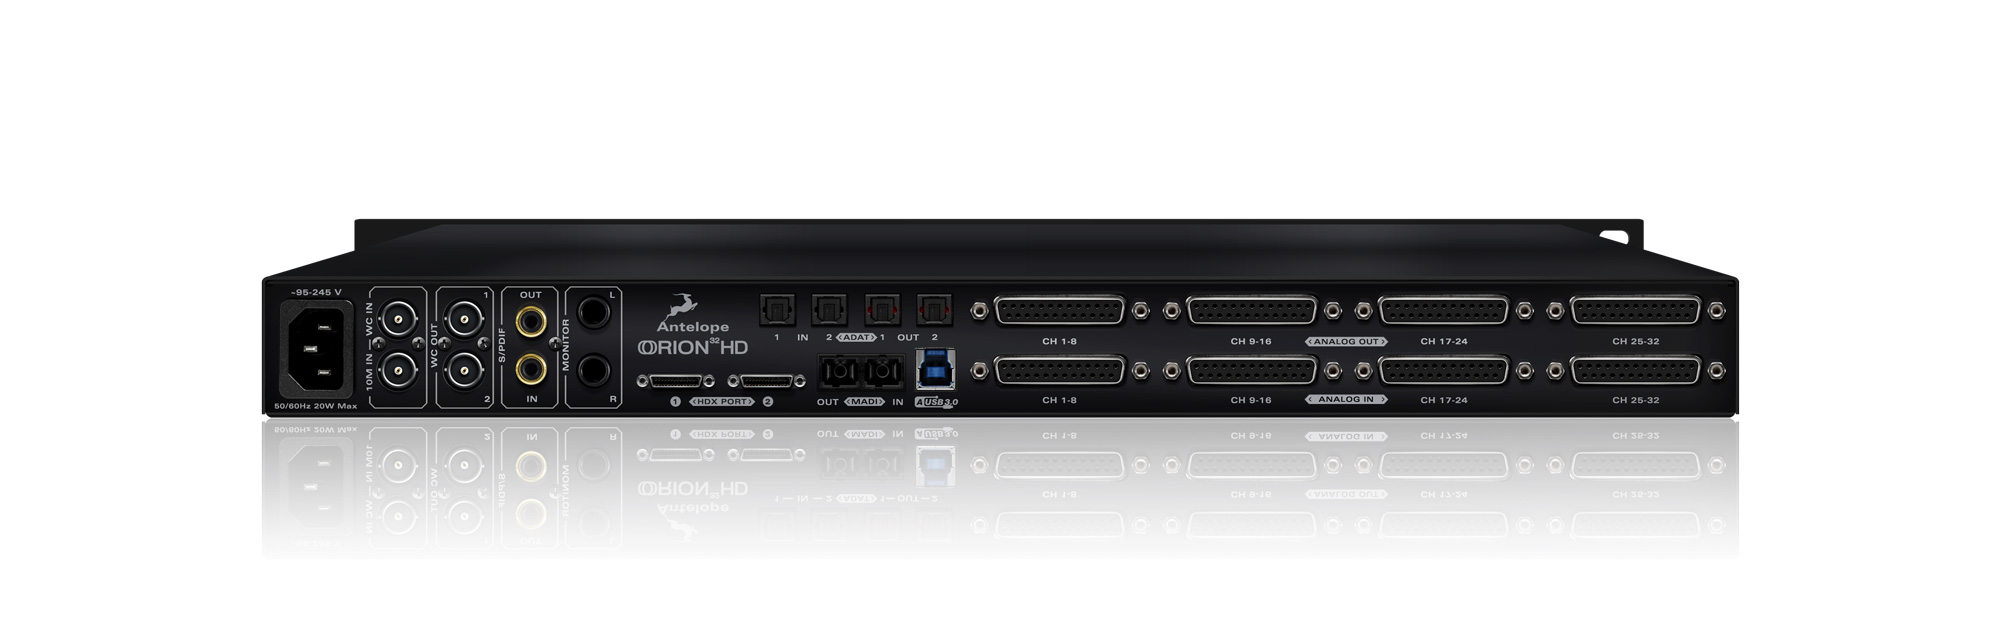 ORION32 HD Back